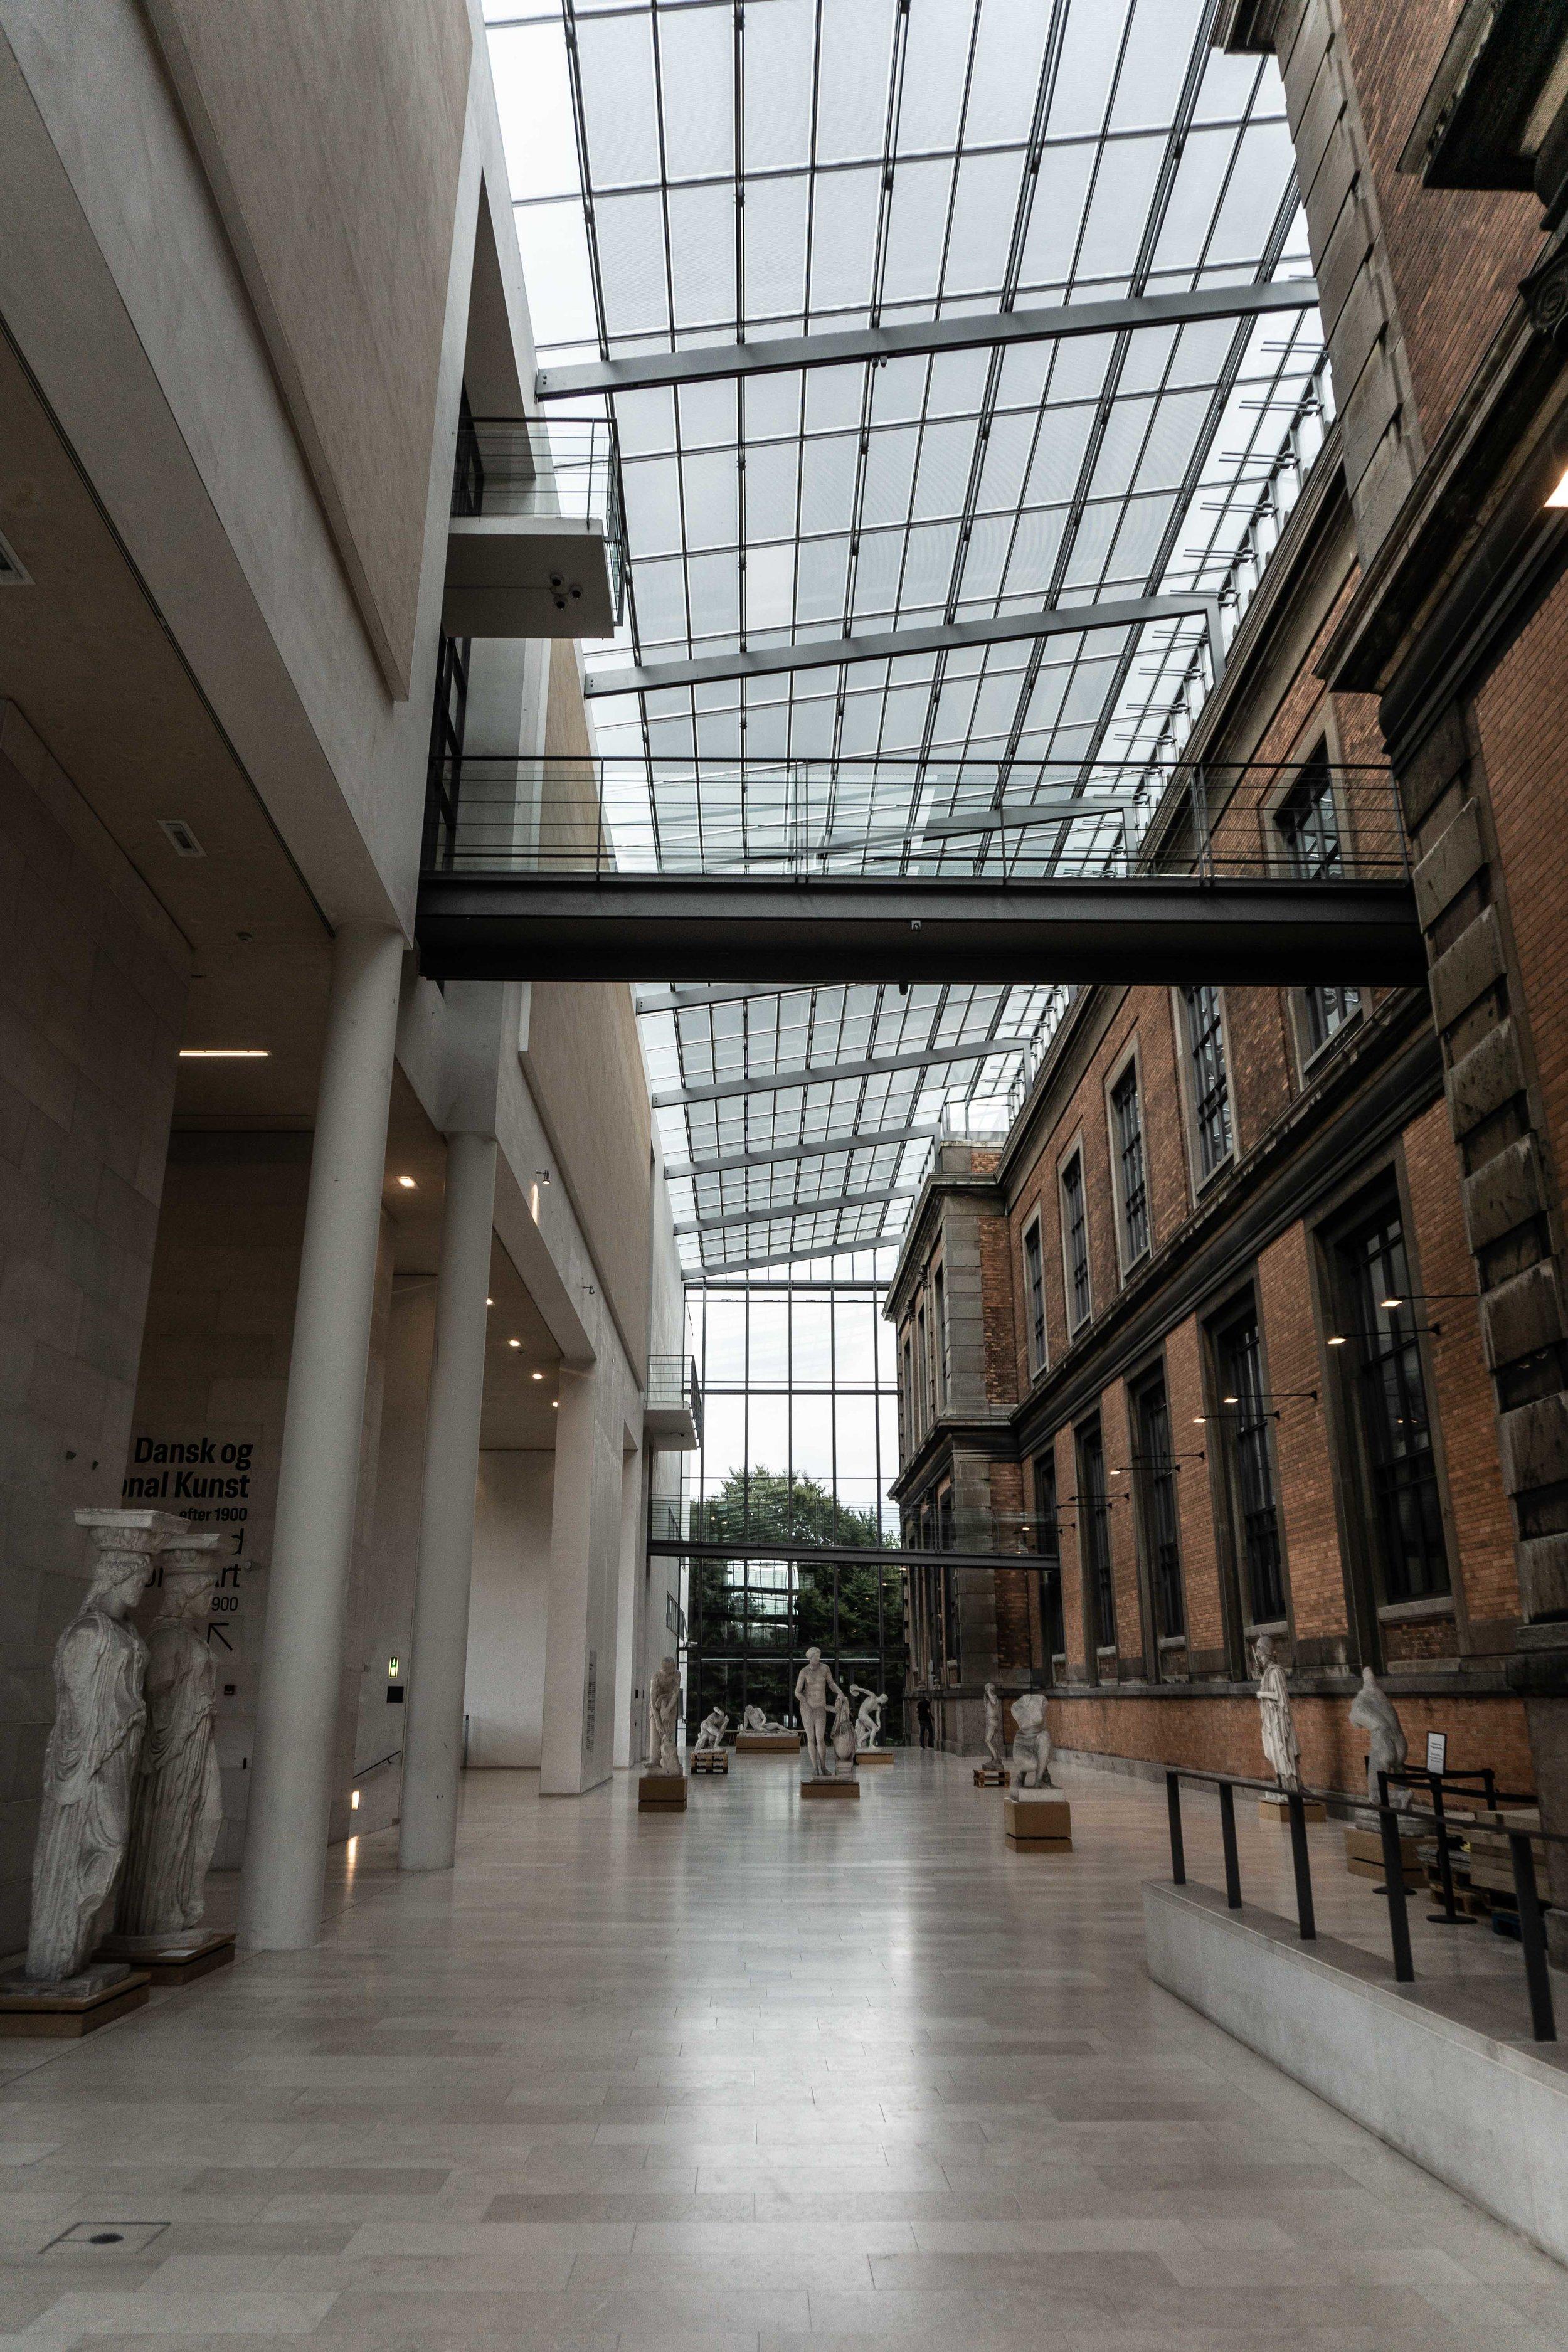 Interior of Kunst Art Museum